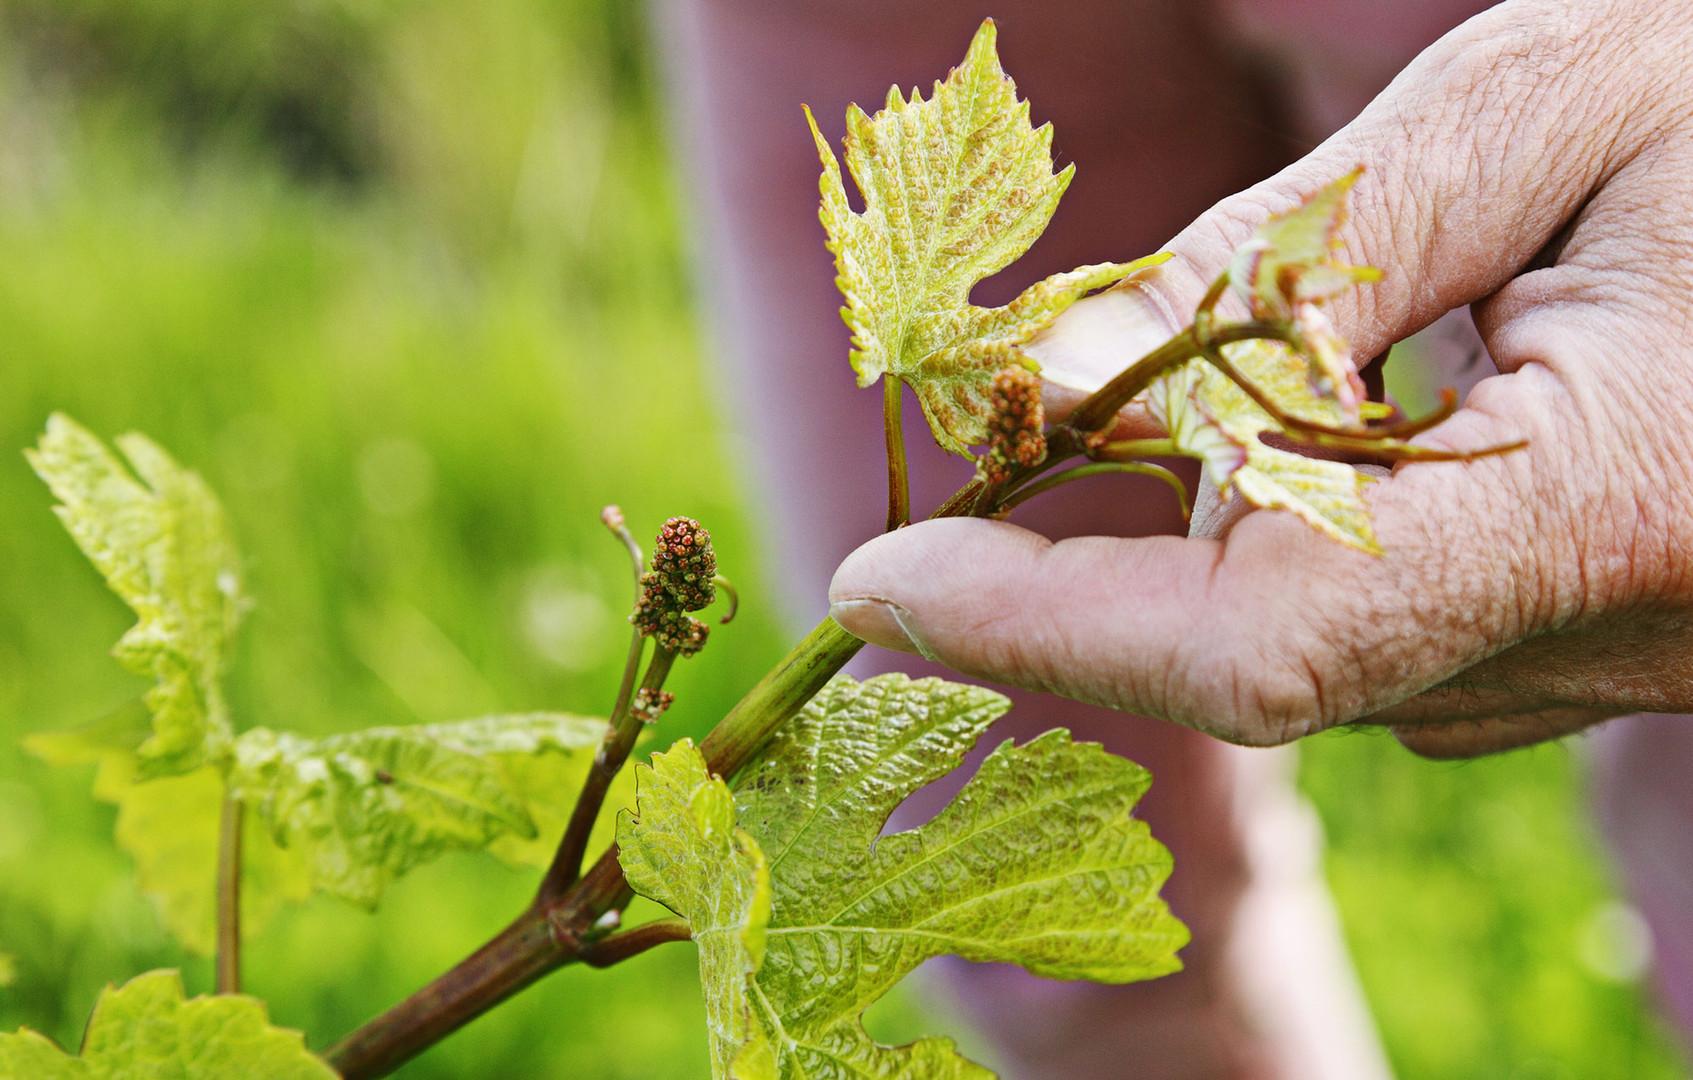 Vigne-plante-AdobeStock_159274853_2000px